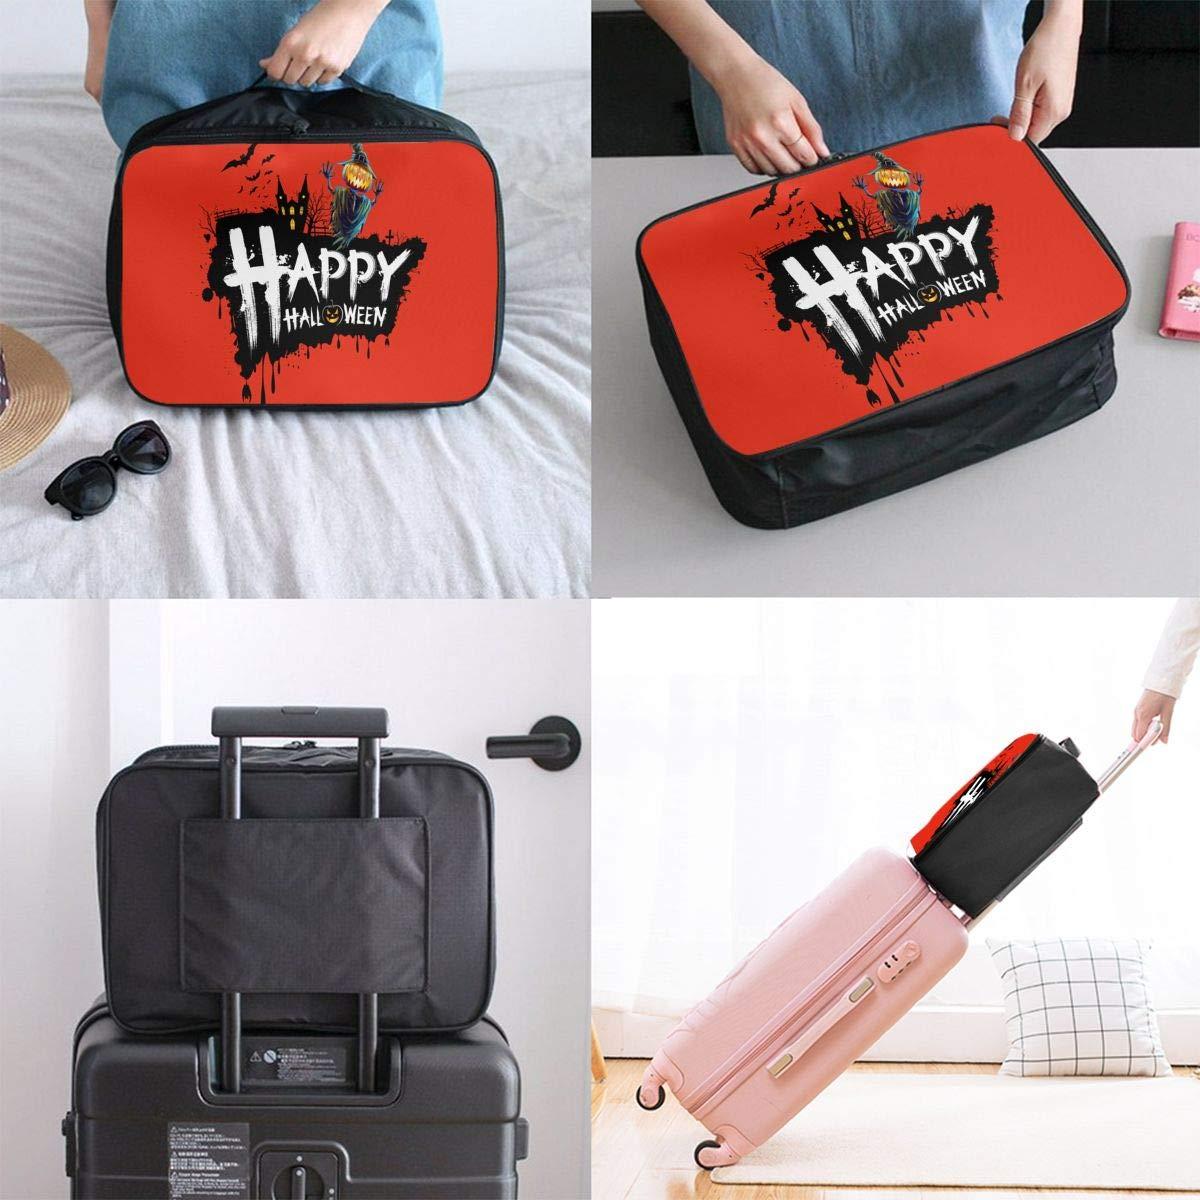 Travel Luggage Duffle Bag Lightweight Portable Handbag Halloween Pumpkin Large Capacity Waterproof Foldable Storage Tote